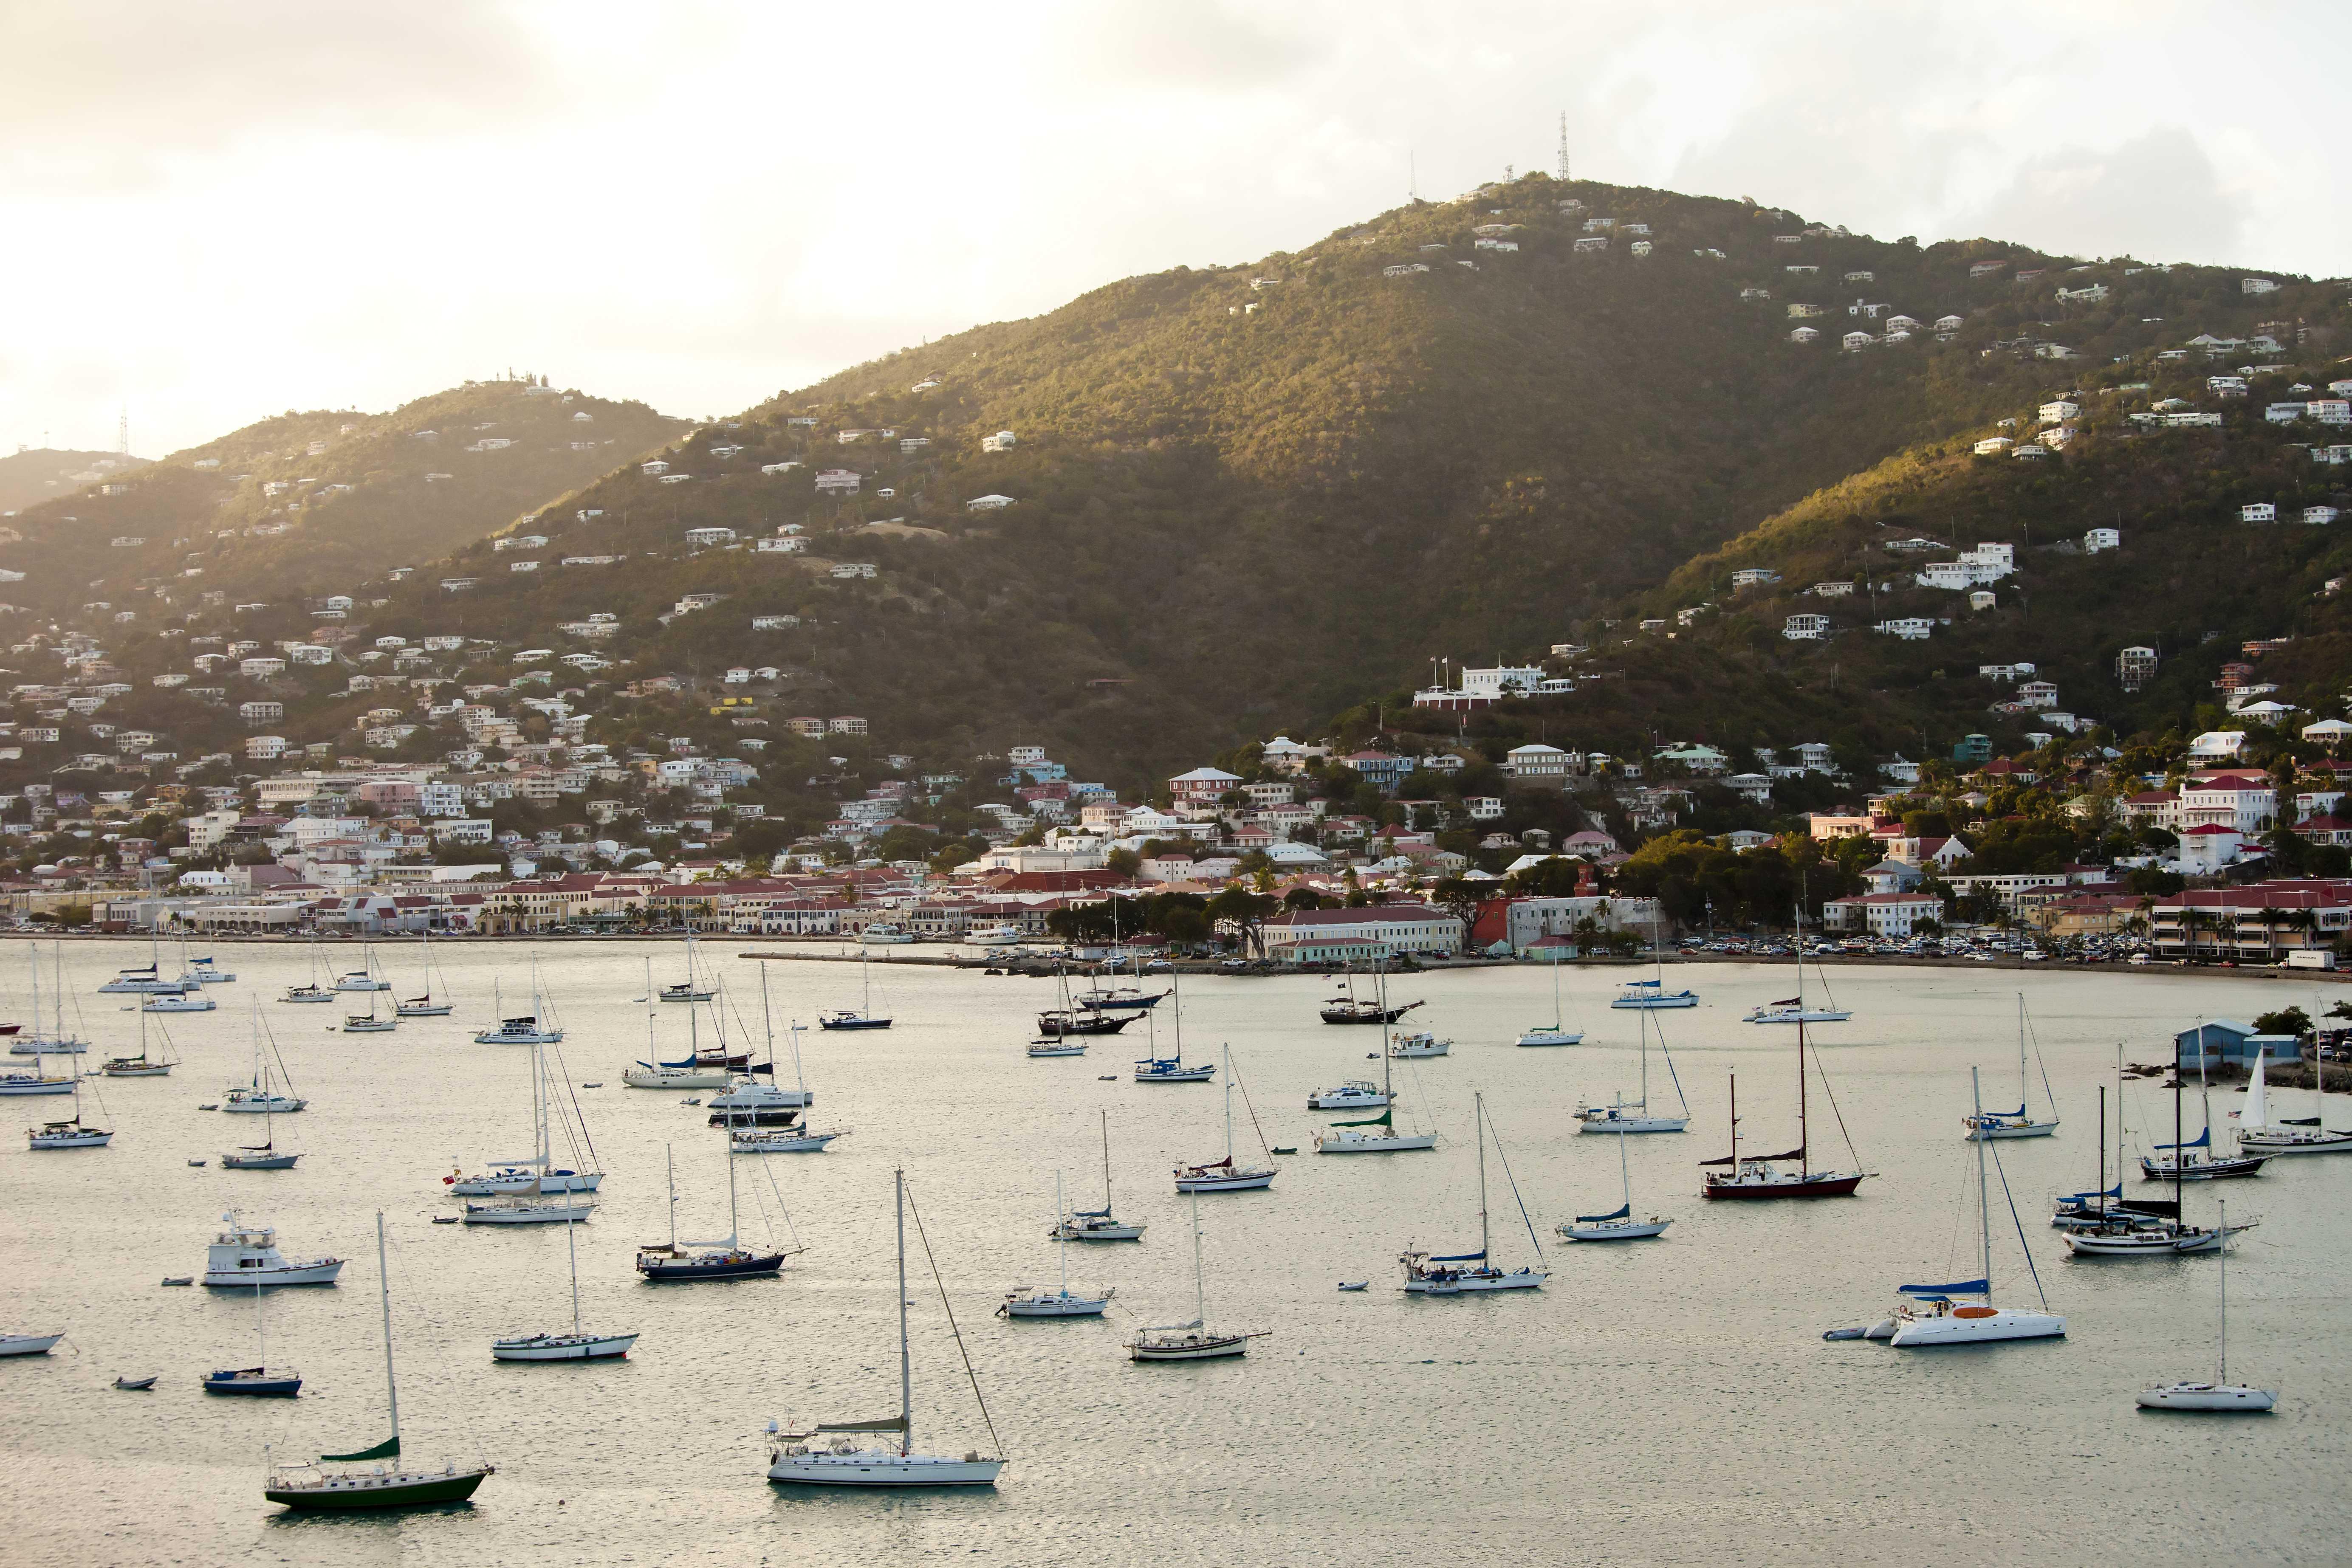 Requested Relief Supplies Sent To U.S. Virgin Islands